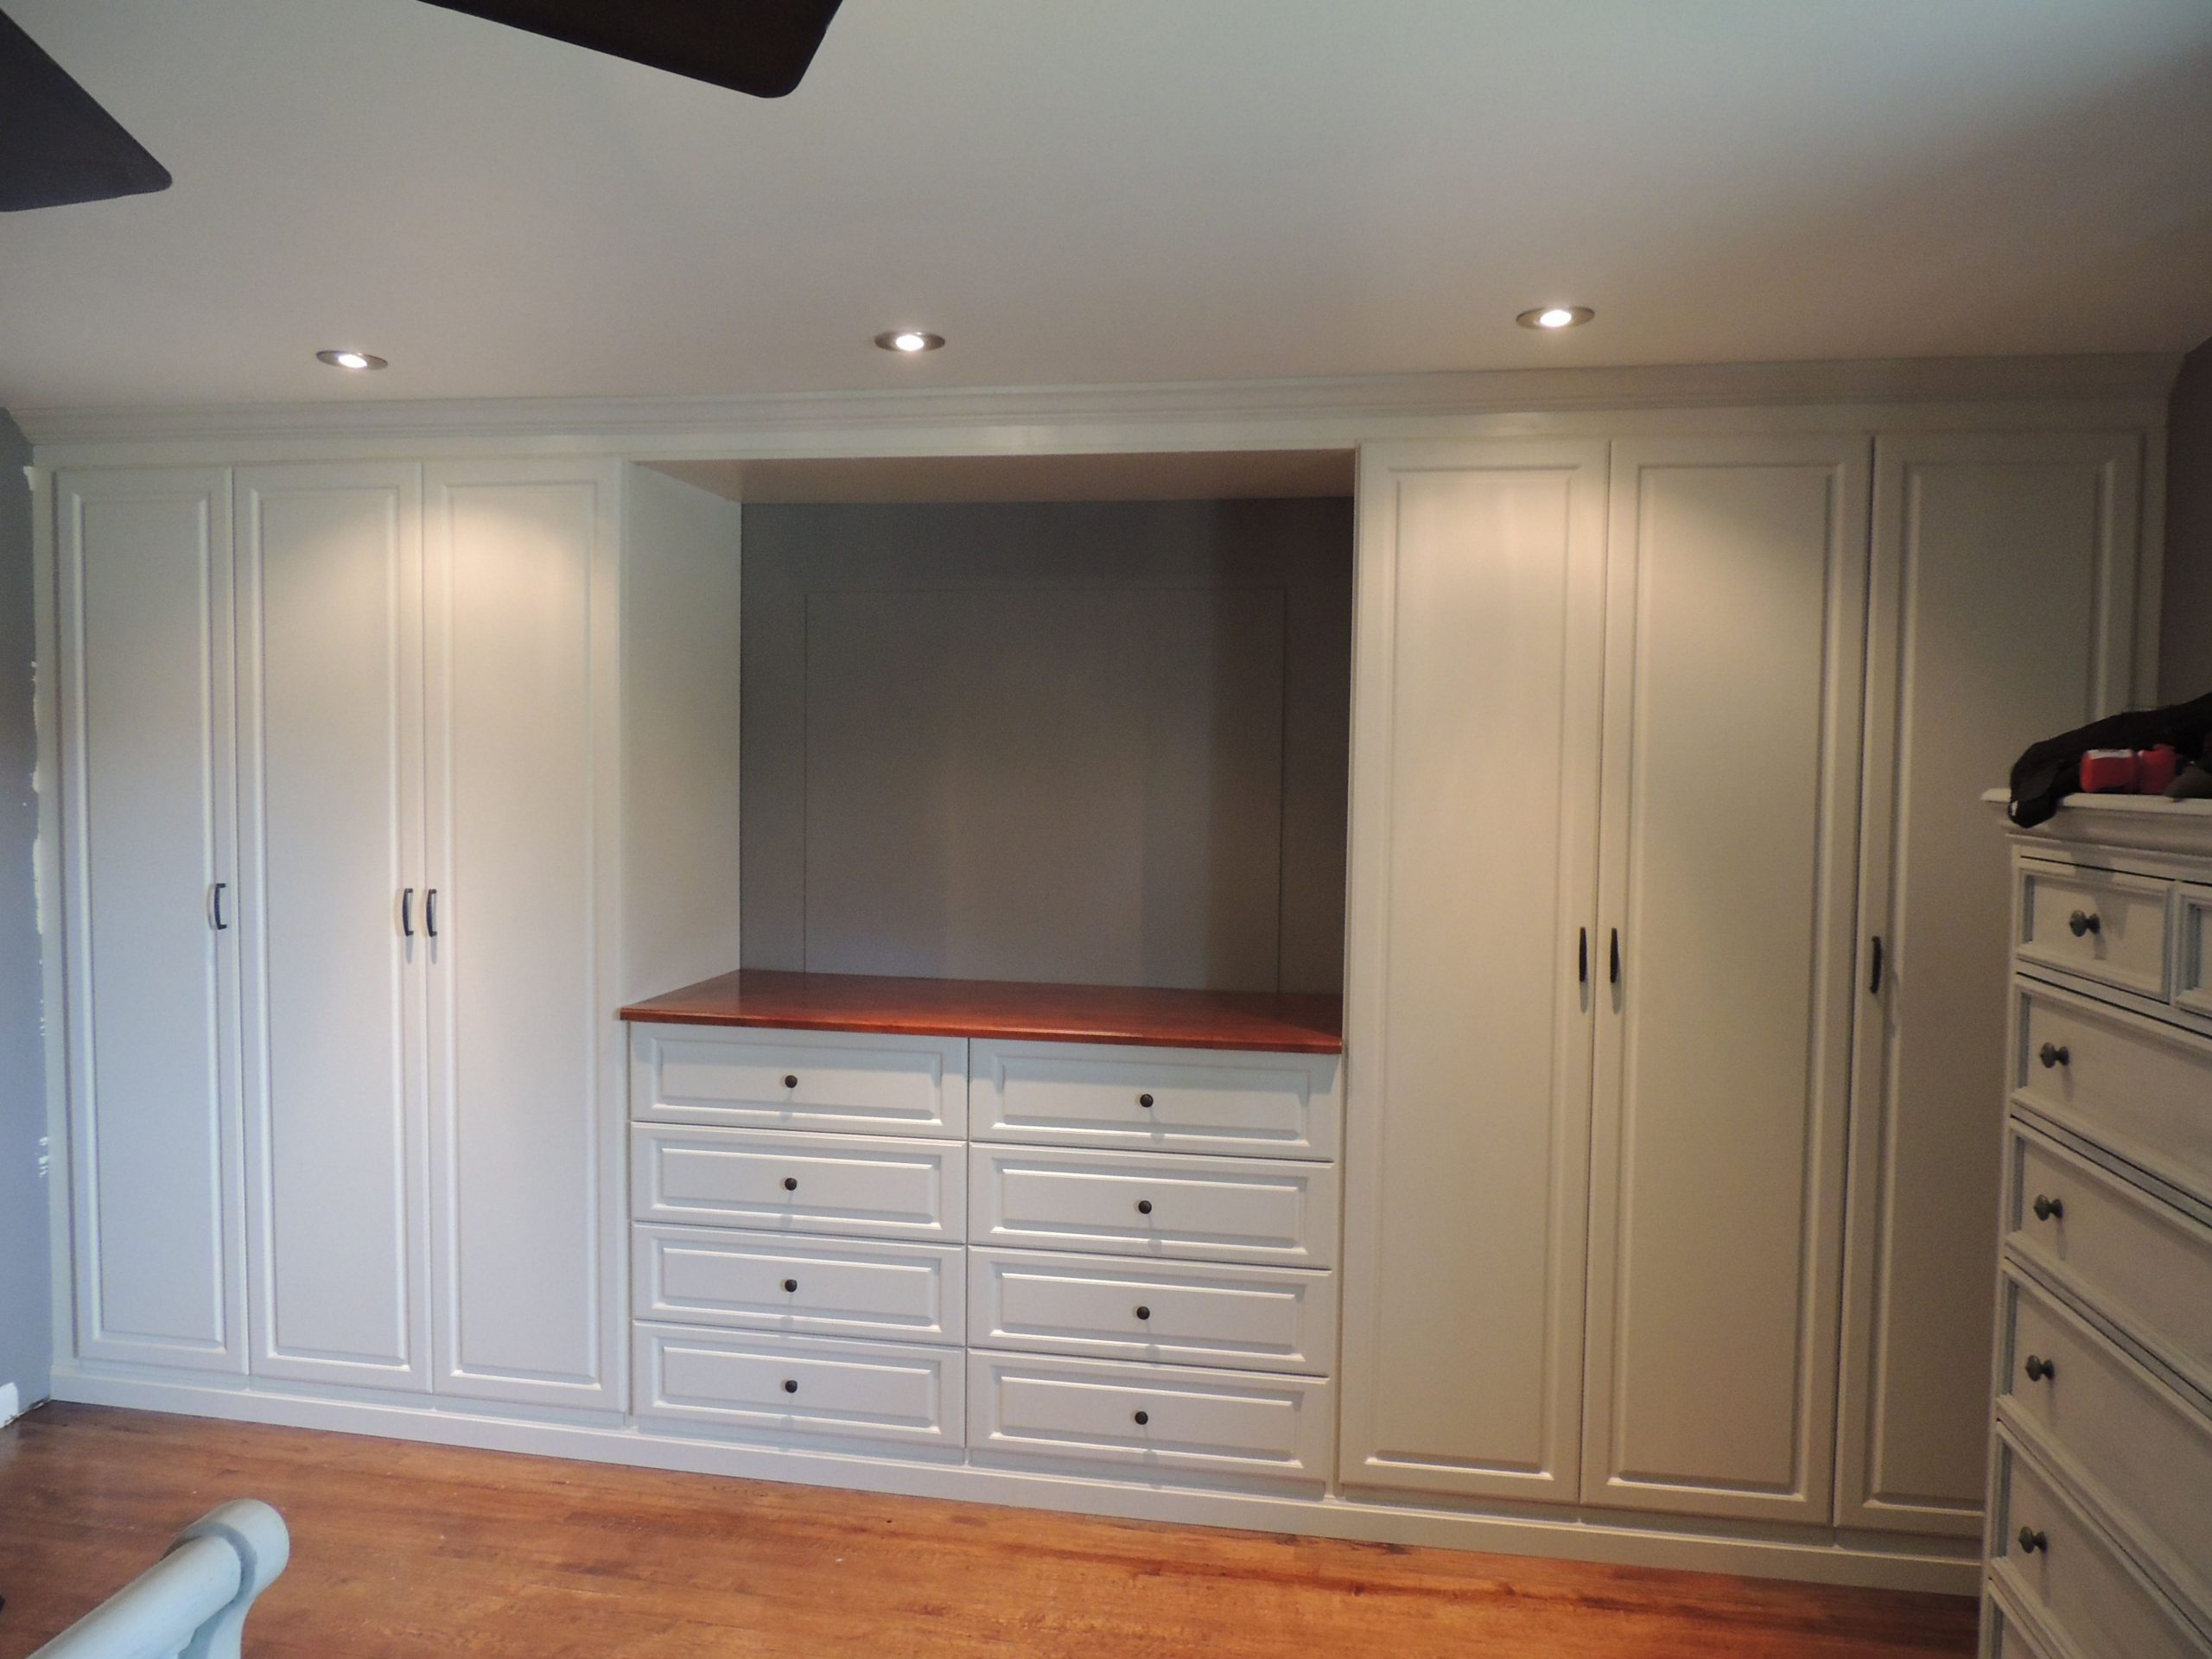 Custom white wall unit in a master bedroom  Bedroom wall units  - Closet Ideas Bedroom